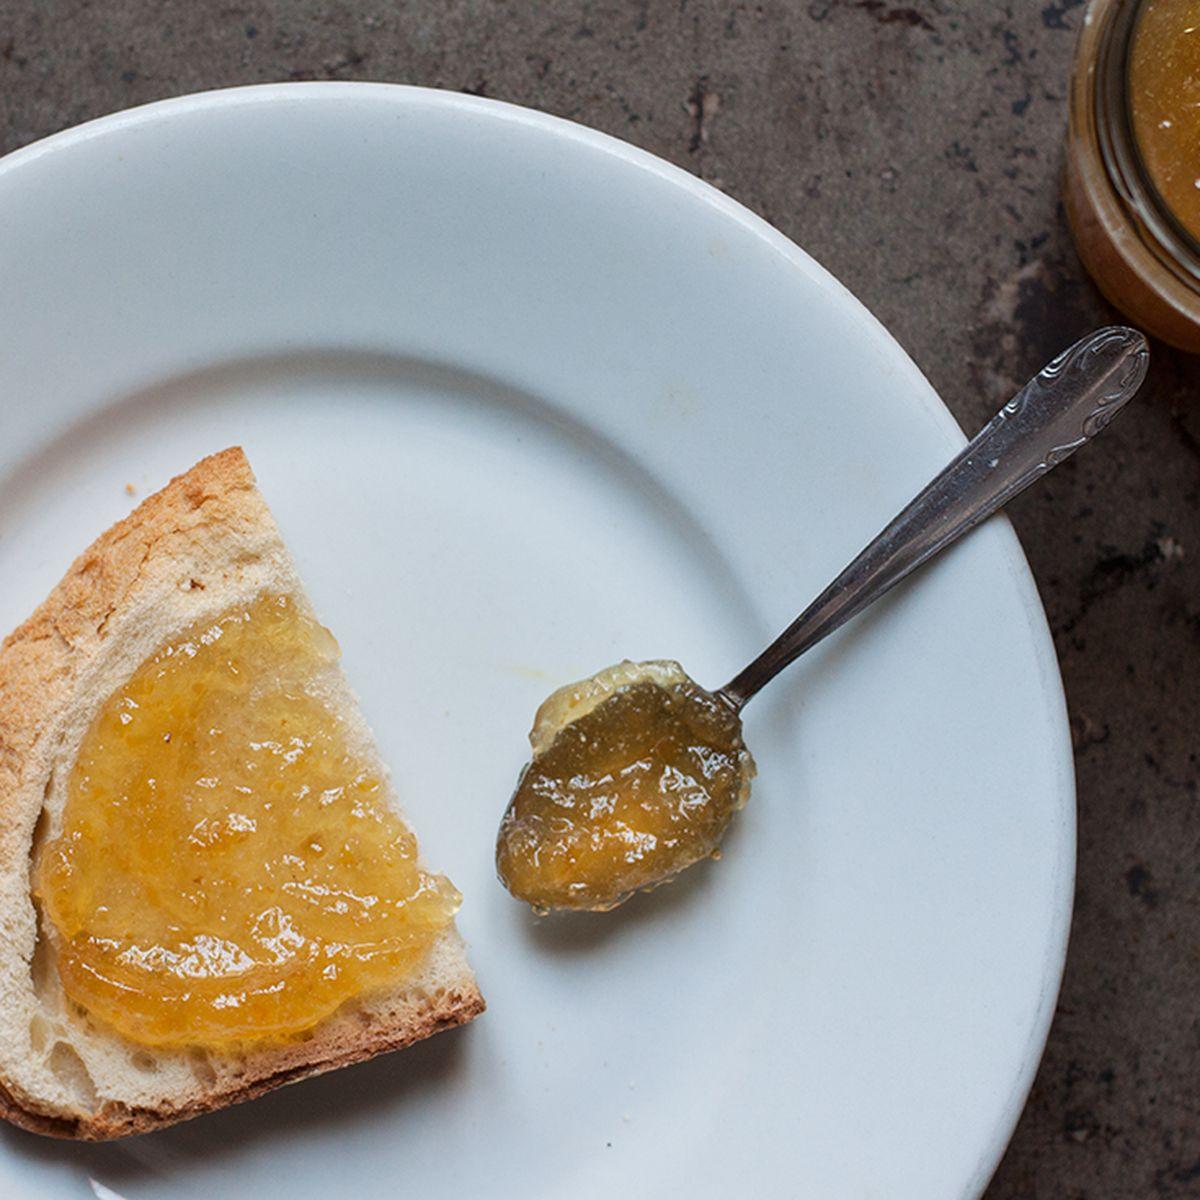 How to Make Lemon Marmalade